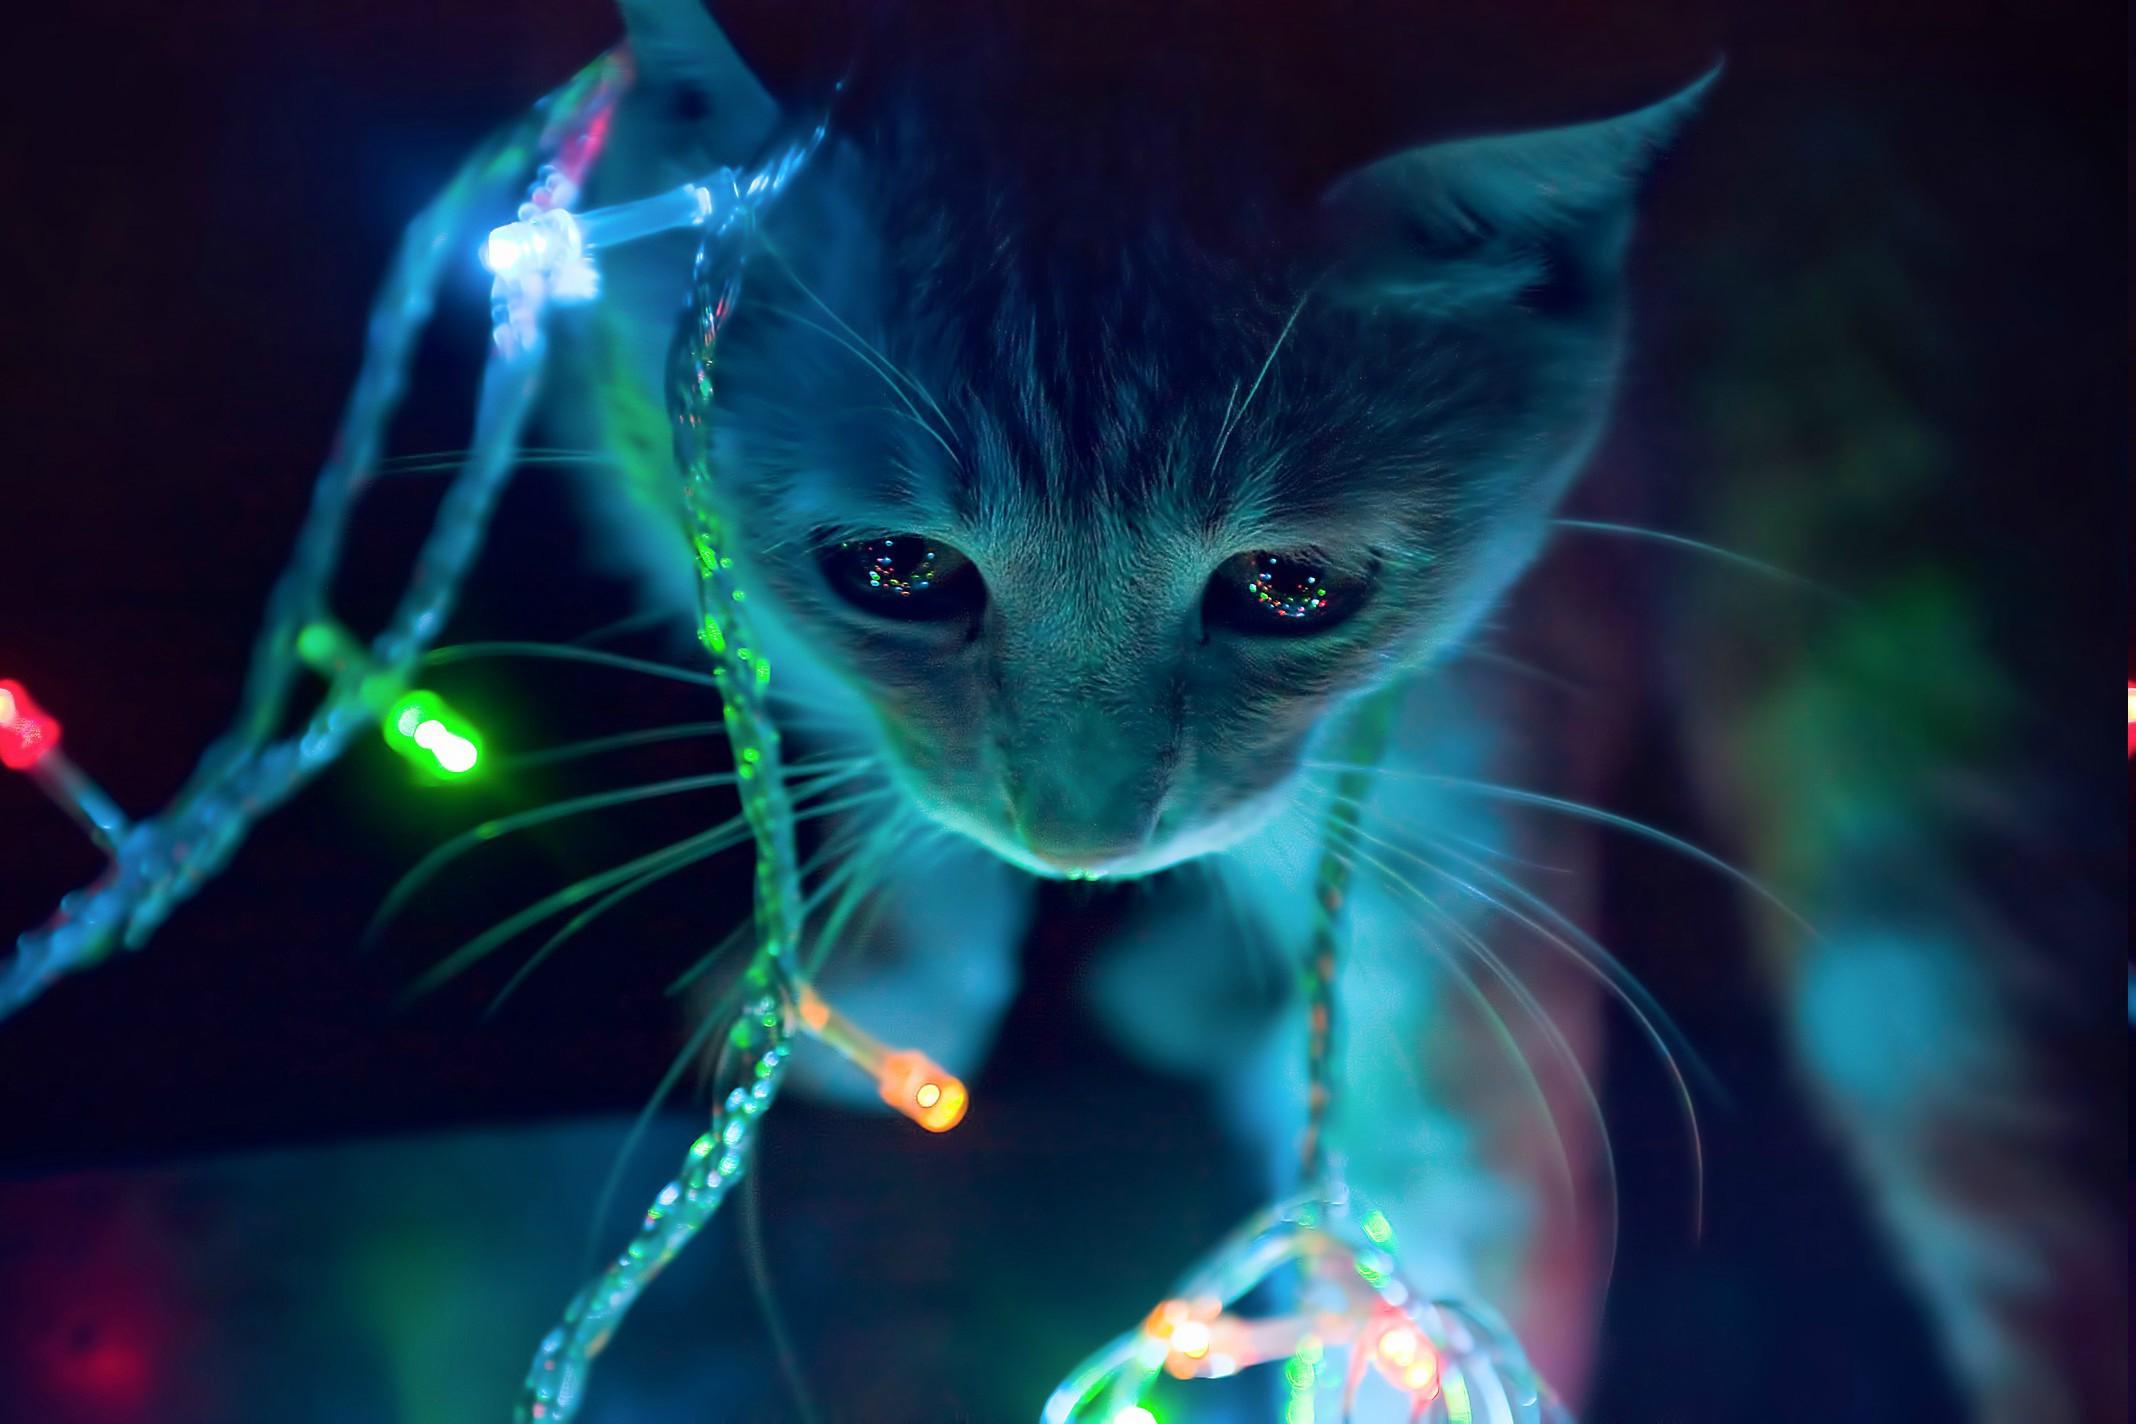 Wallpaper  2136x1424 px, animals, cats, christmas lights